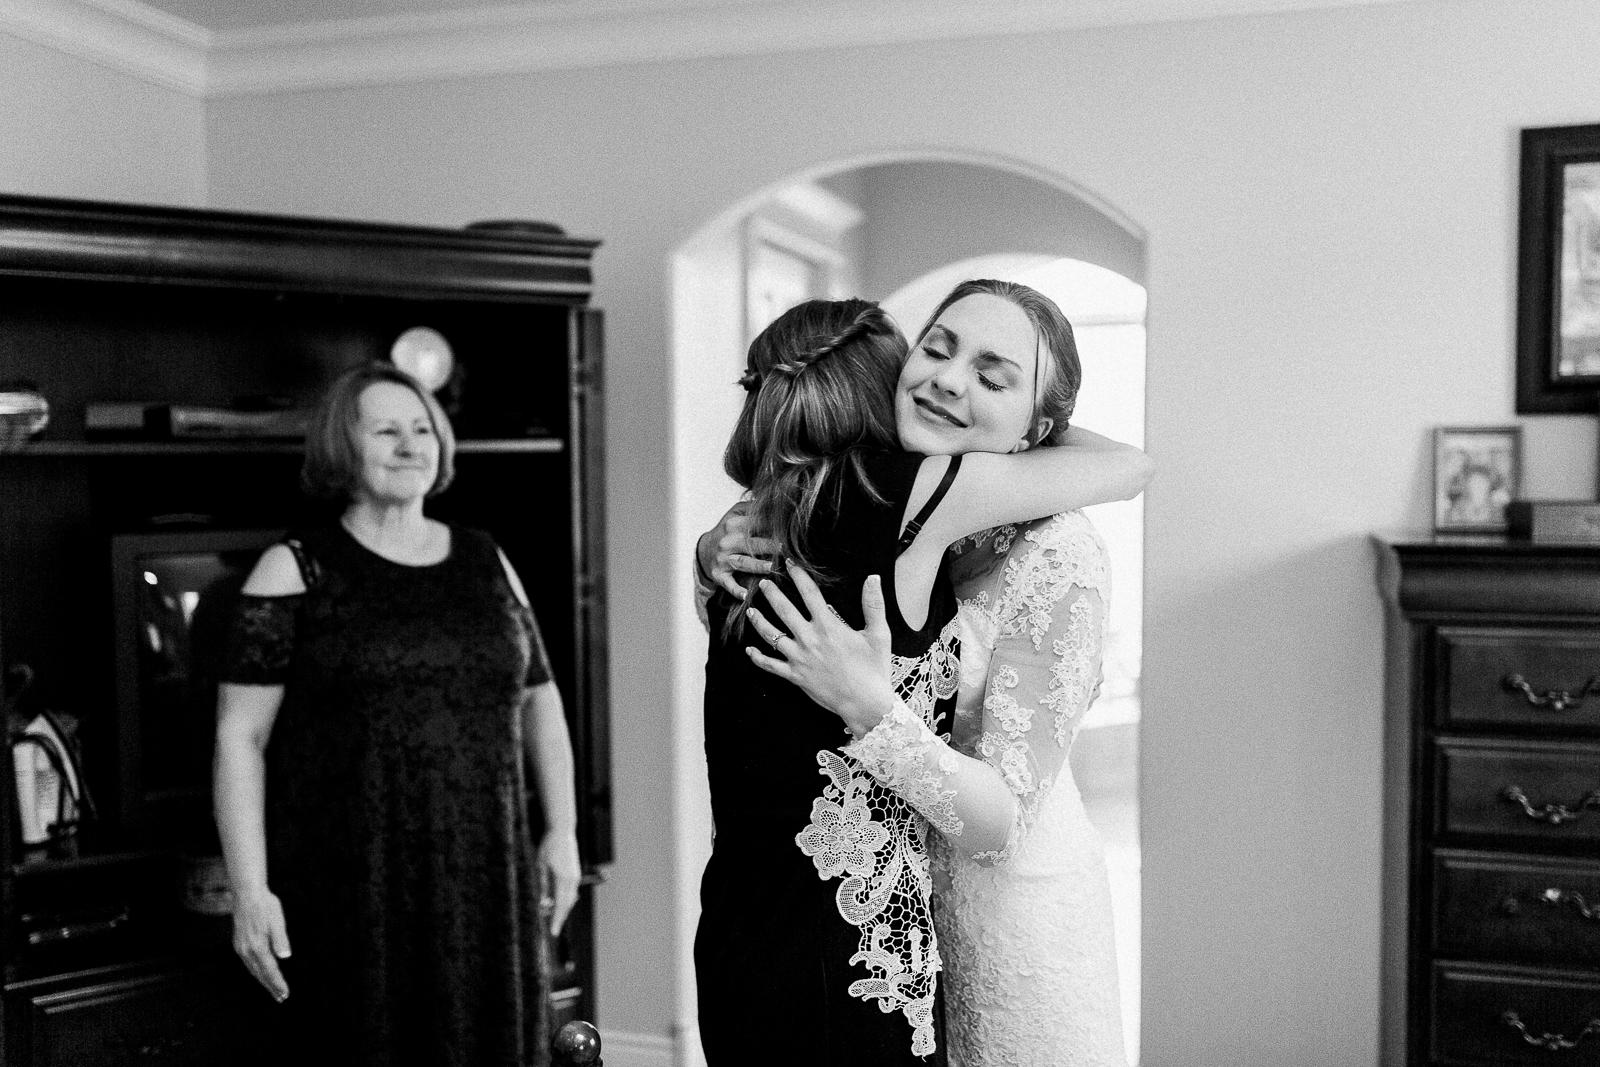 gander-wedding-photographer-31.jpg